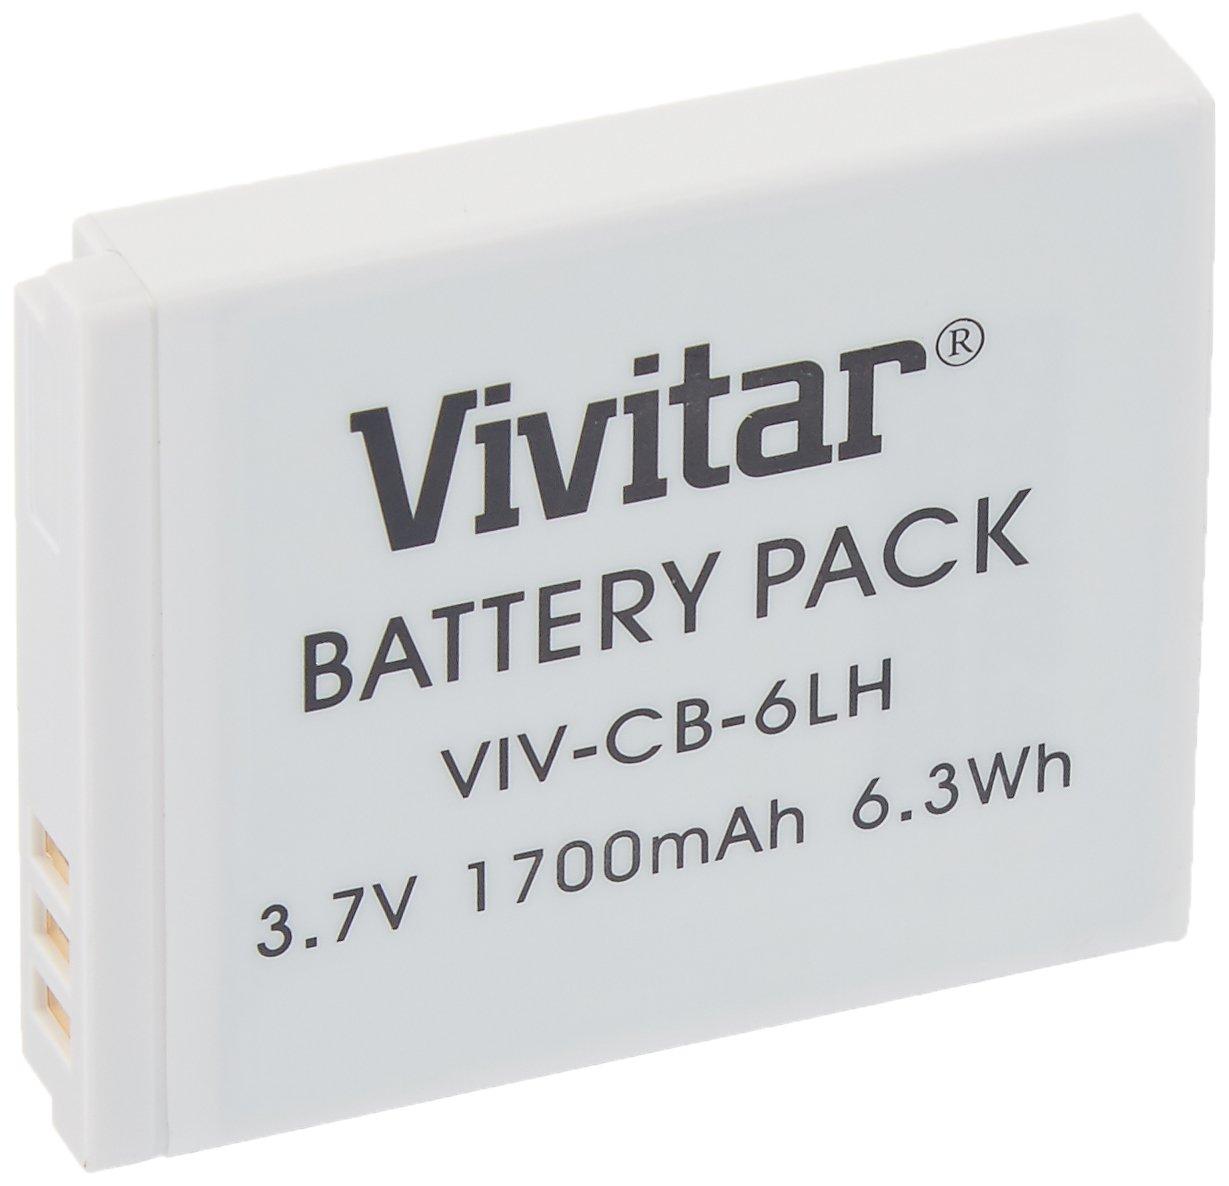 Vivitar NB-6L / NB-6LH Ultra High Capacity 1700mAh Li-ion Replacement Battery for Select Canon Digital Cameras